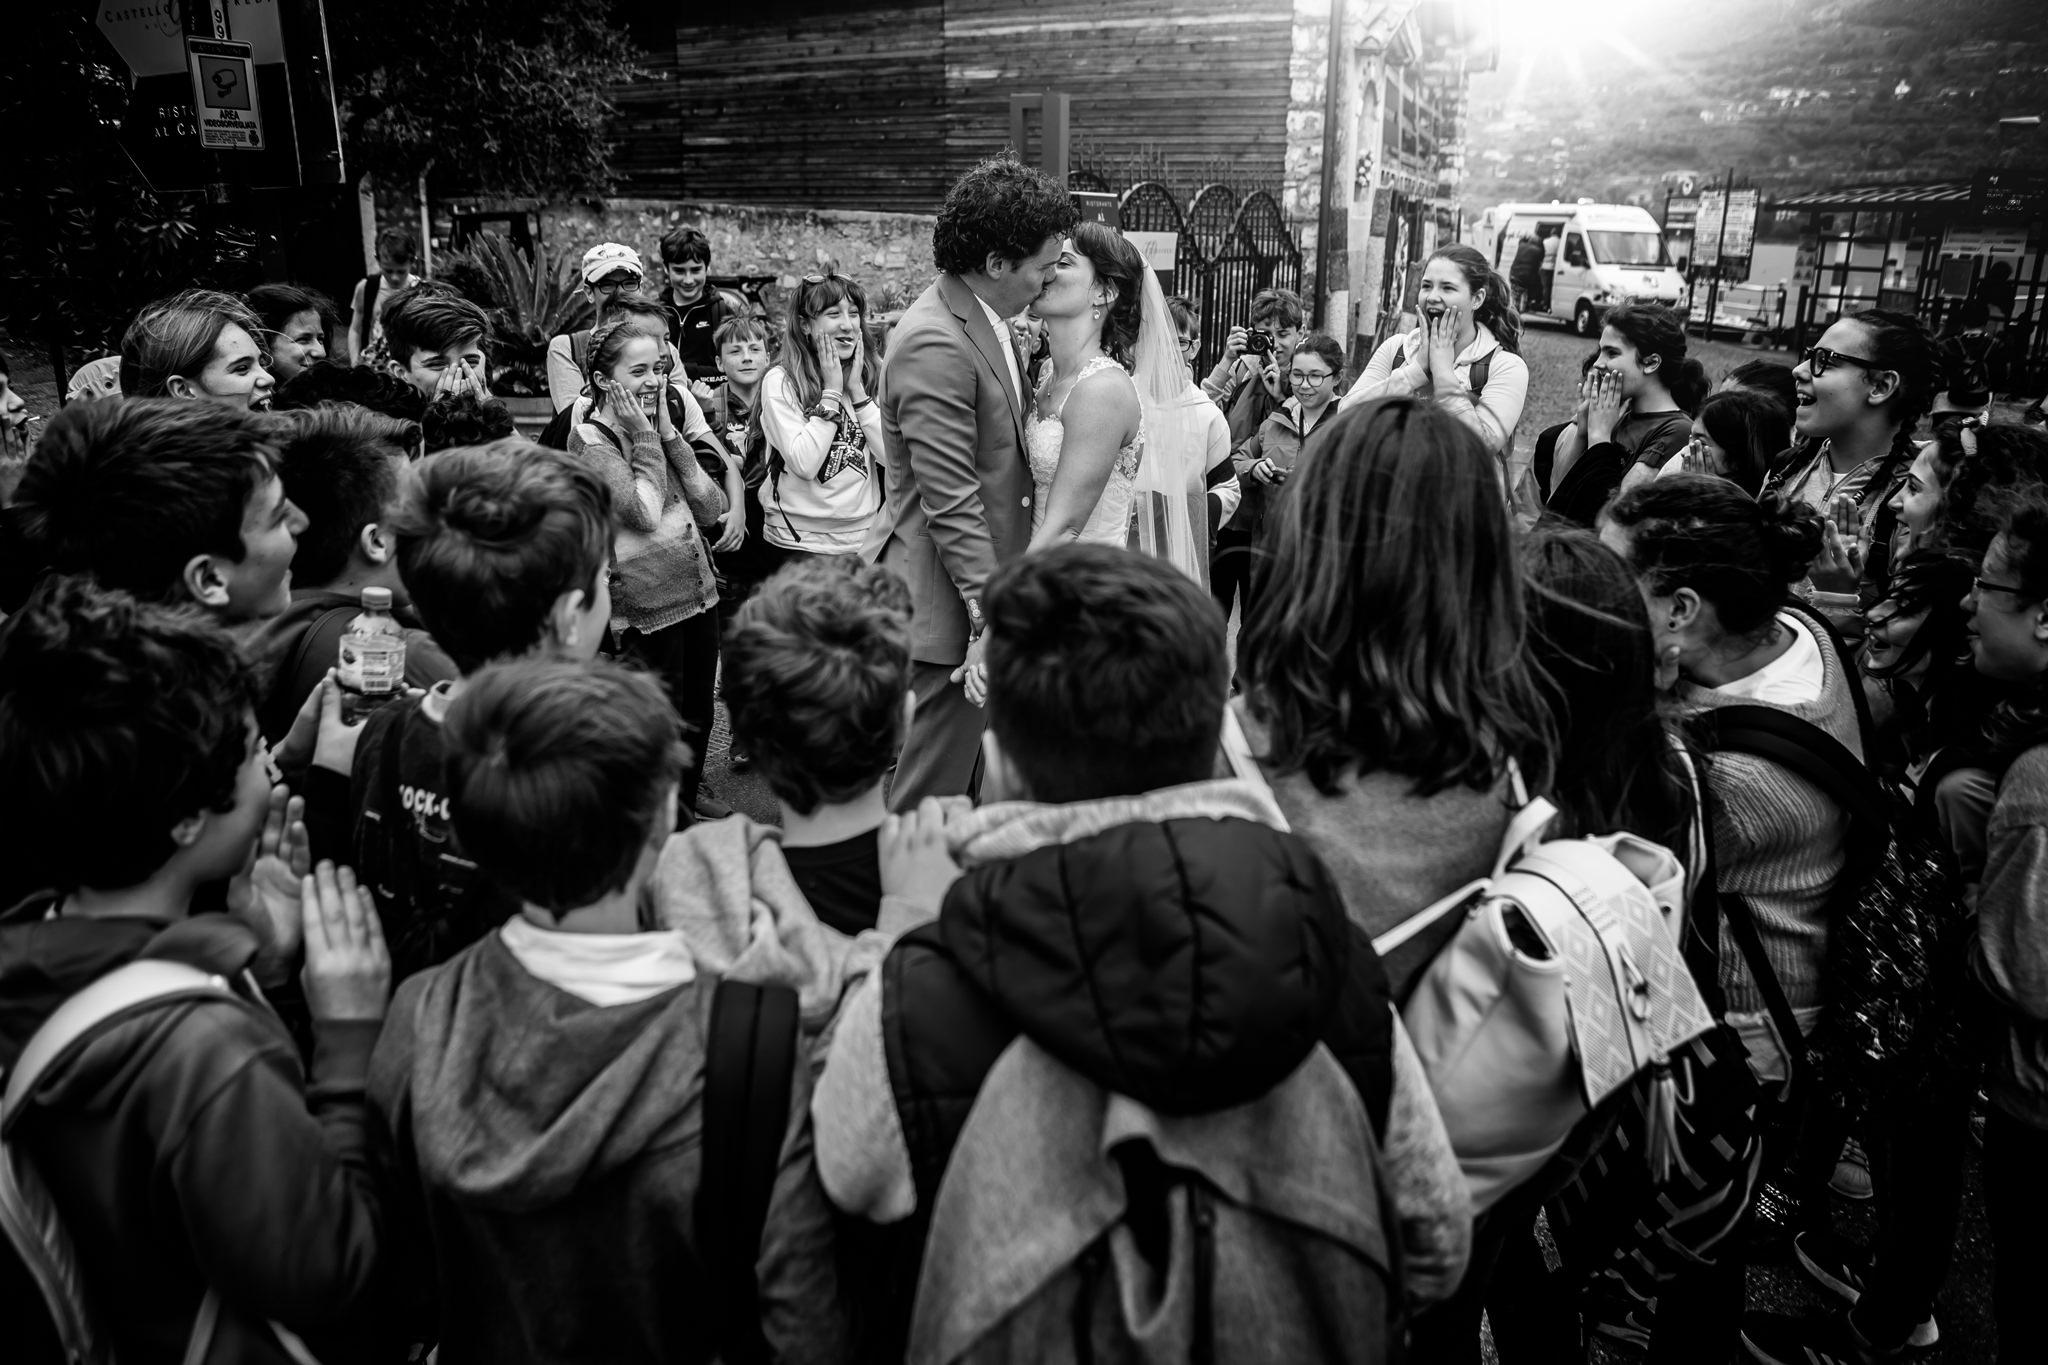 destination-wedding-photographer-italy-bas-driessen-photography-2